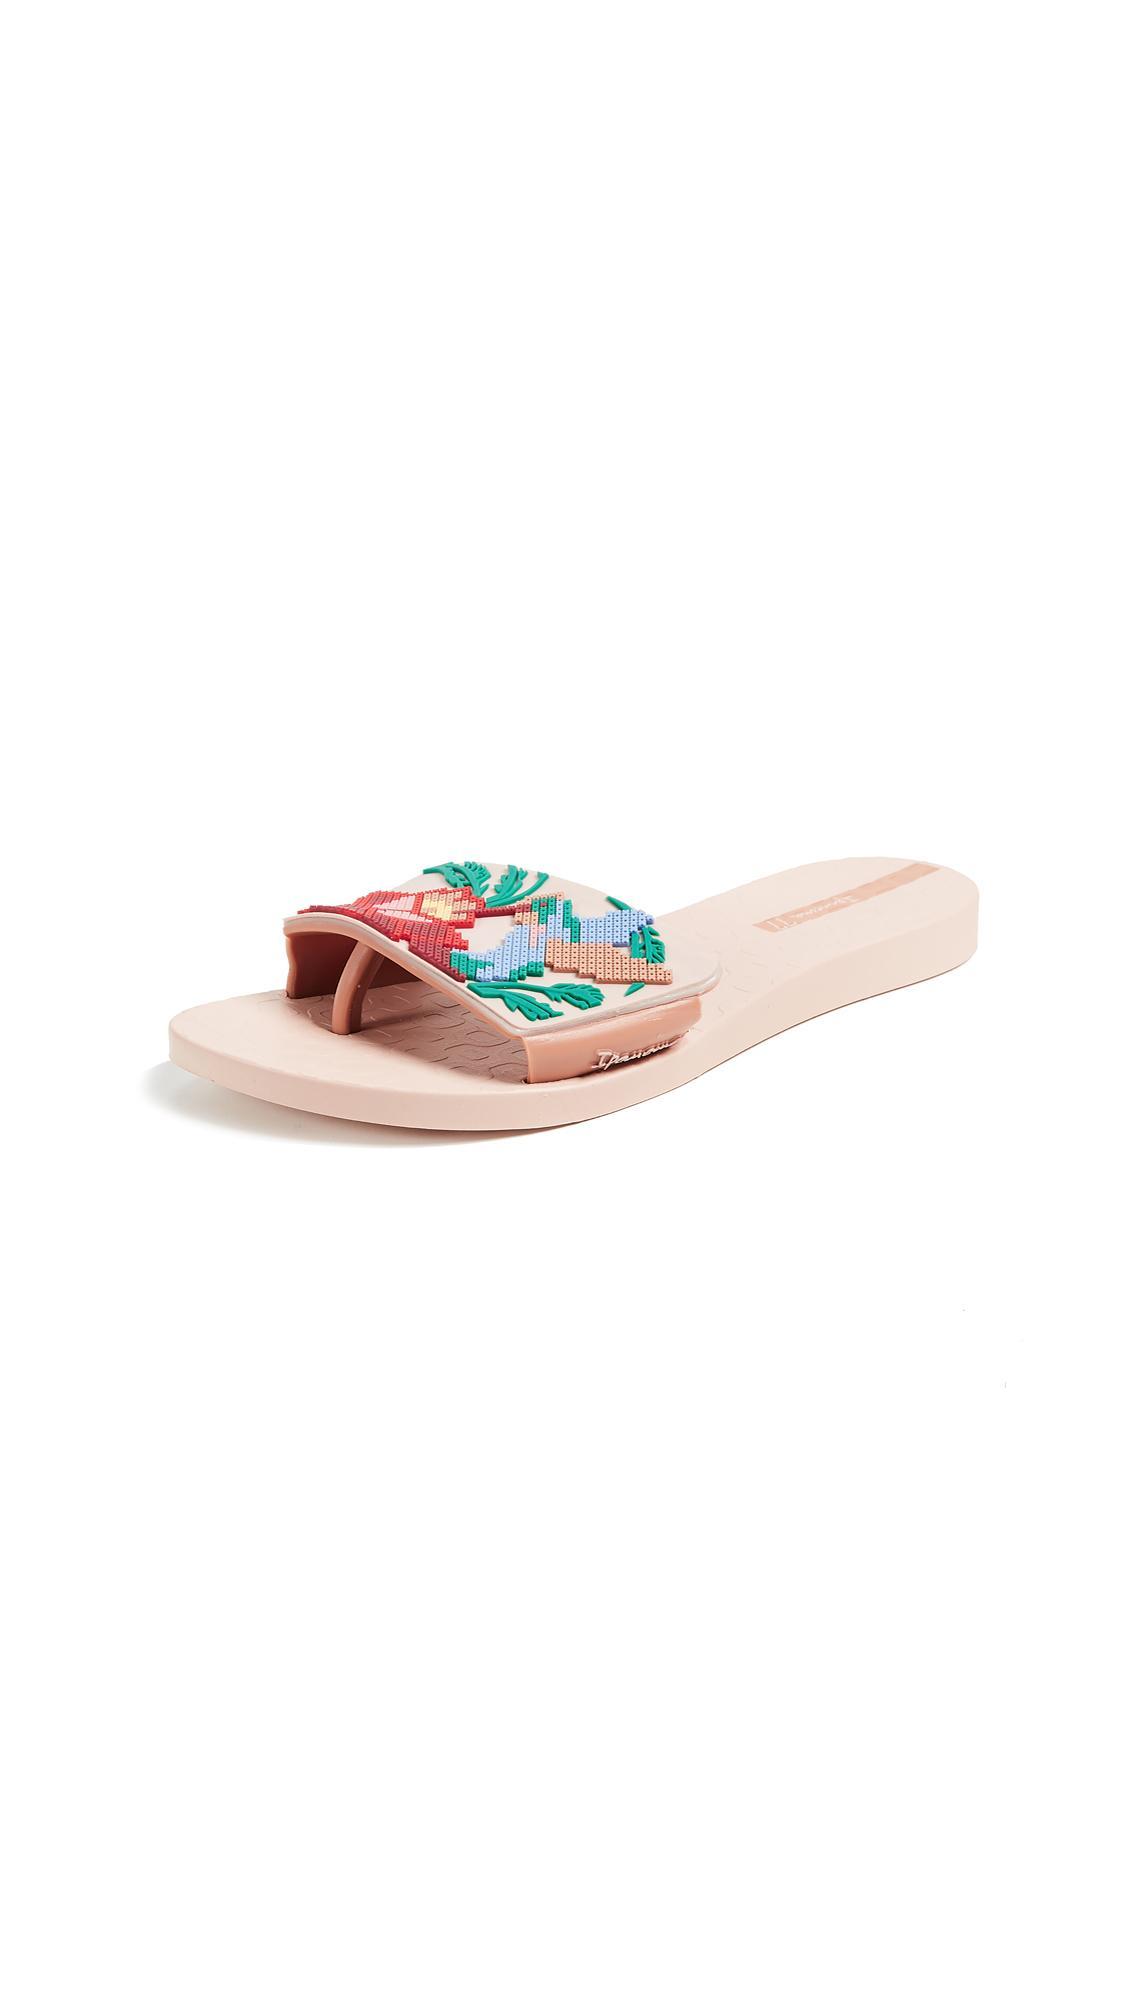 27b702b910e Ipanema Nectar Floral Slide Sandal In Pink Beige